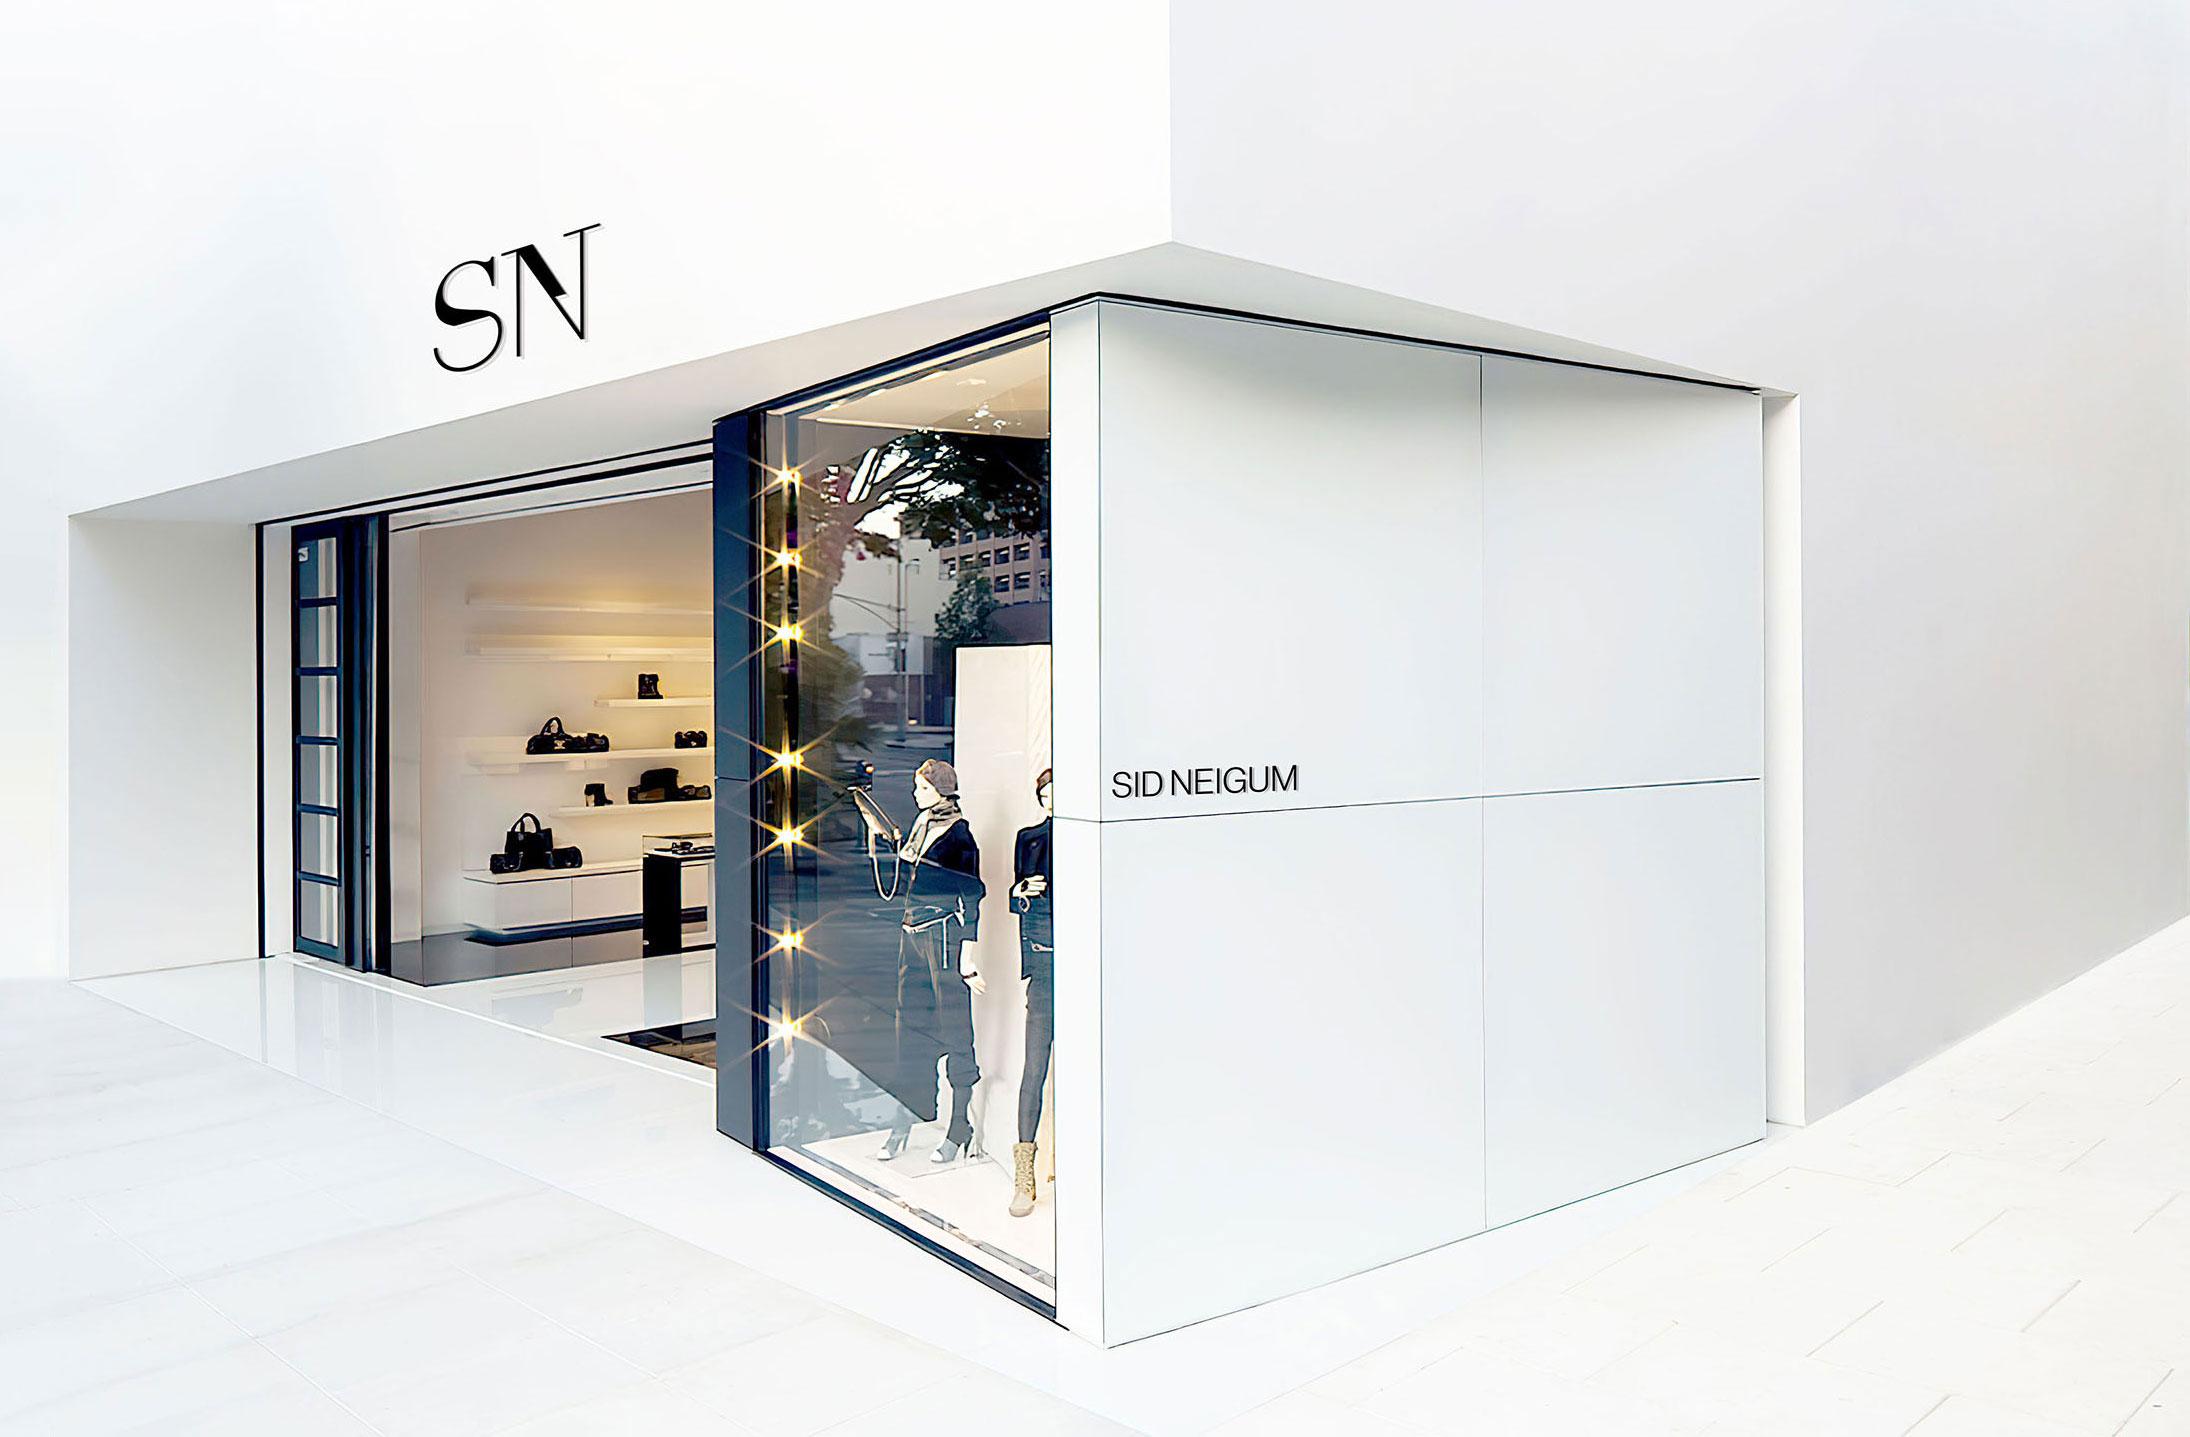 Sid Neigum white modern storefront mockup